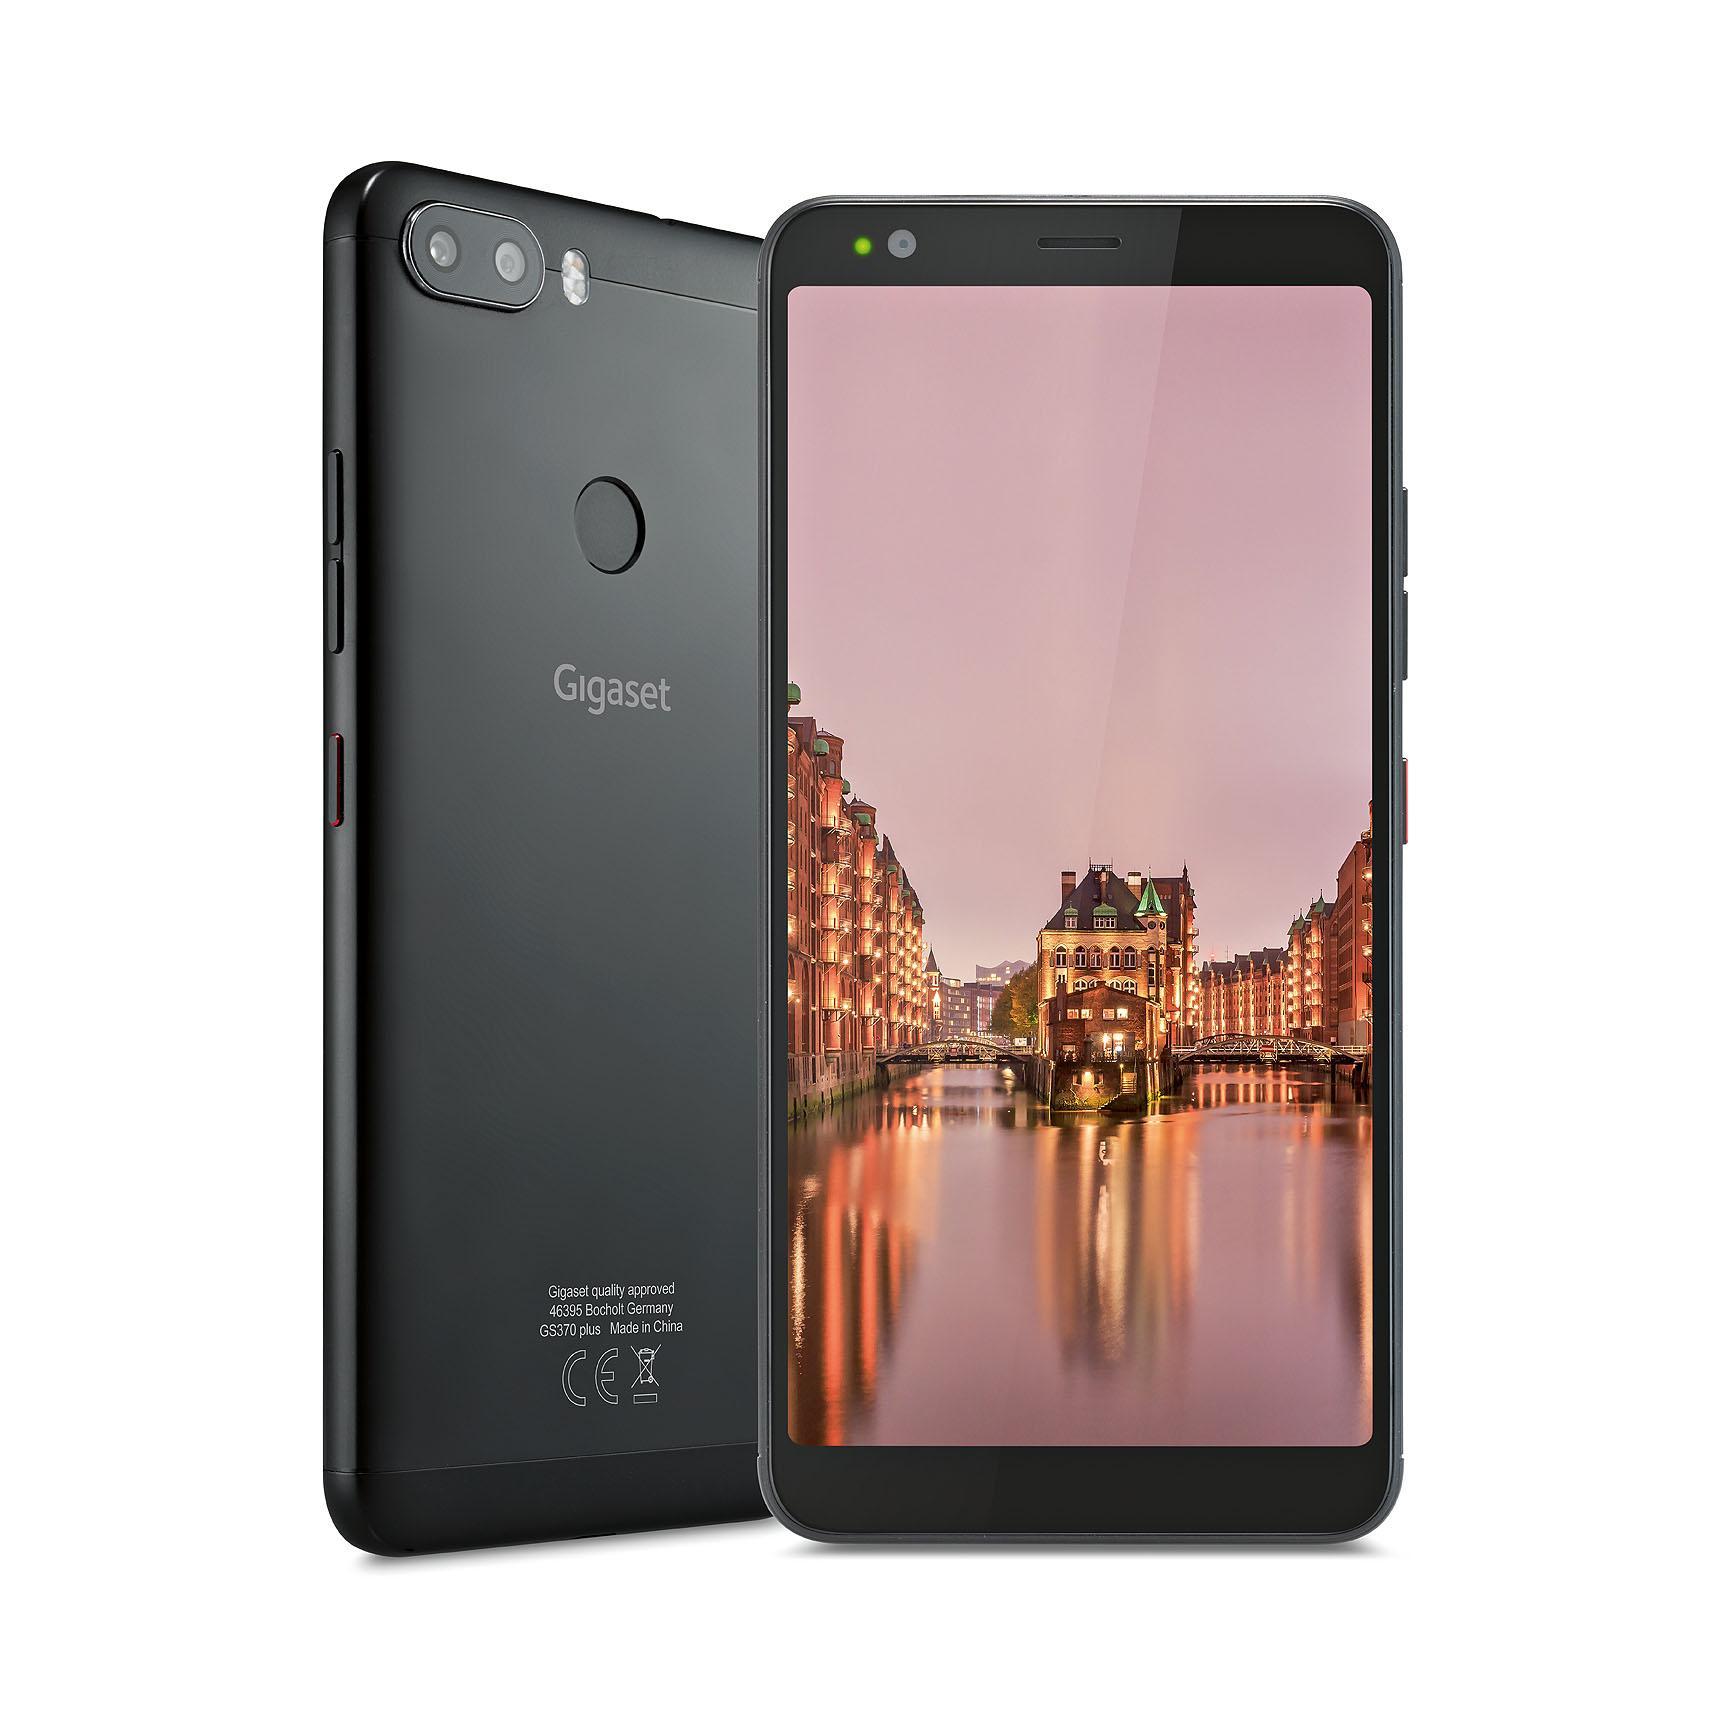 Gigaset GS370 plus Smartphone: Amazon.de: Elektronik